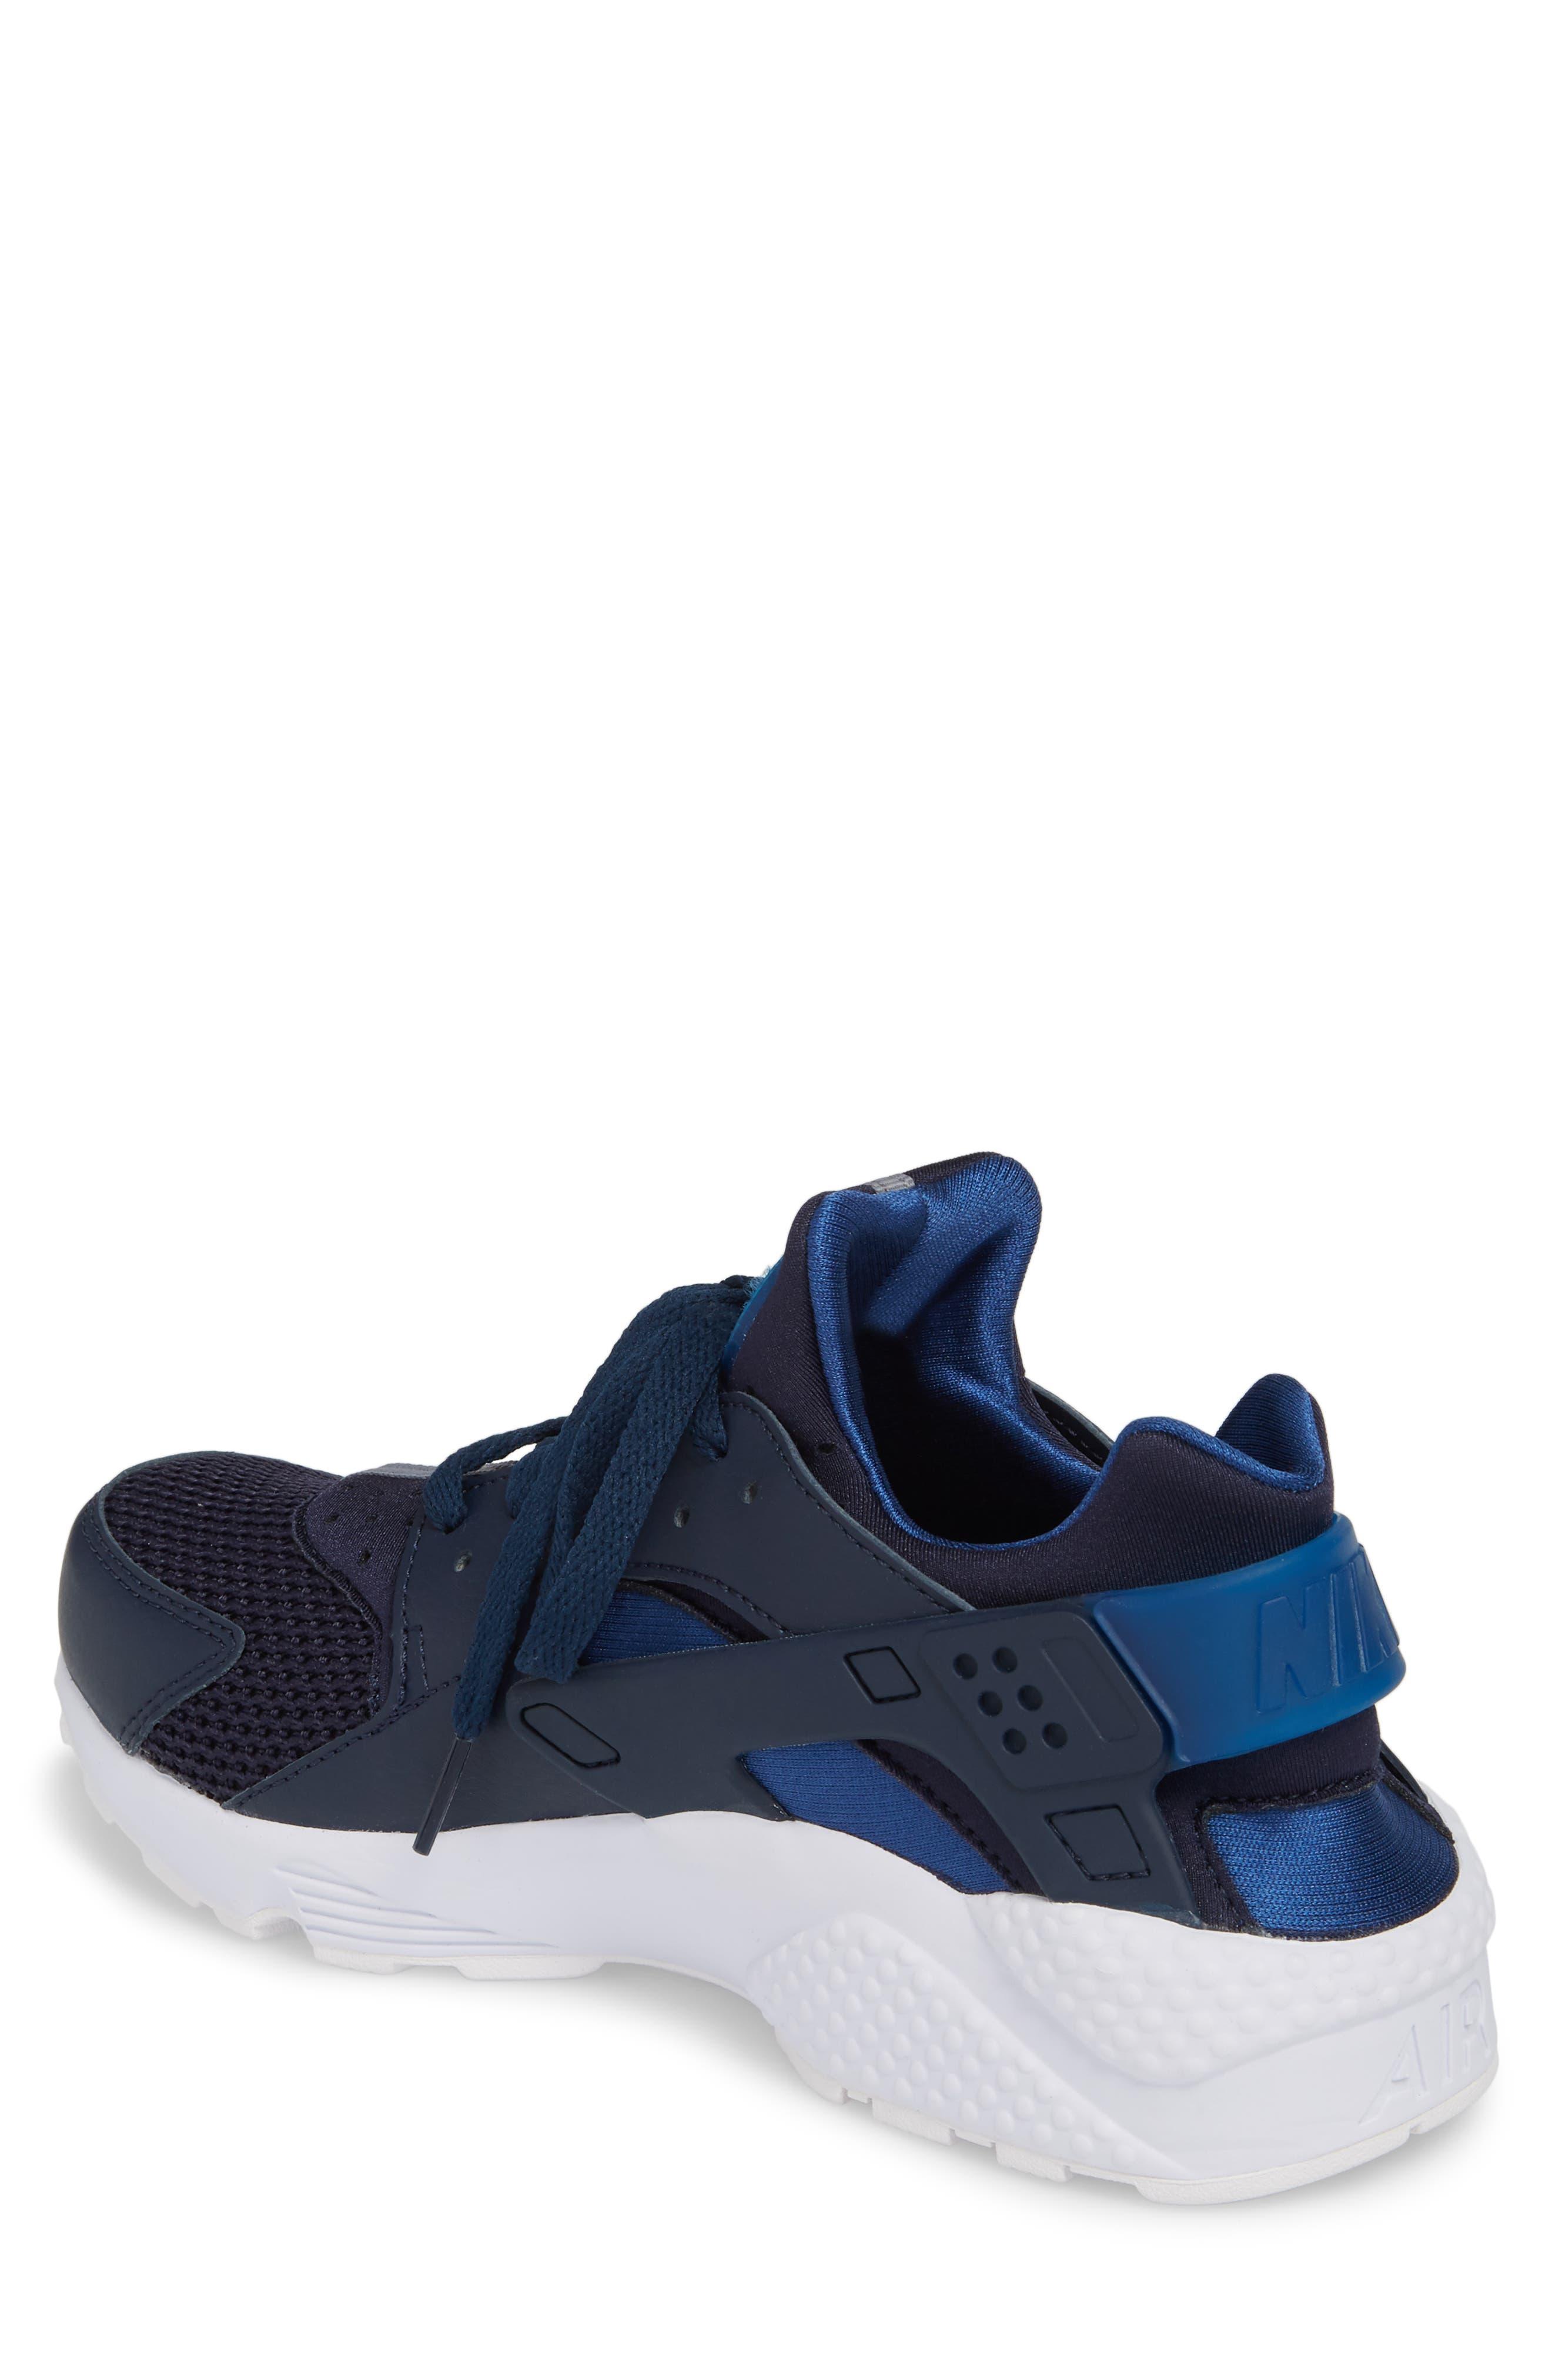 'Air Huarache' Sneaker,                             Alternate thumbnail 2, color,                             Obsidian/ Gym Blue